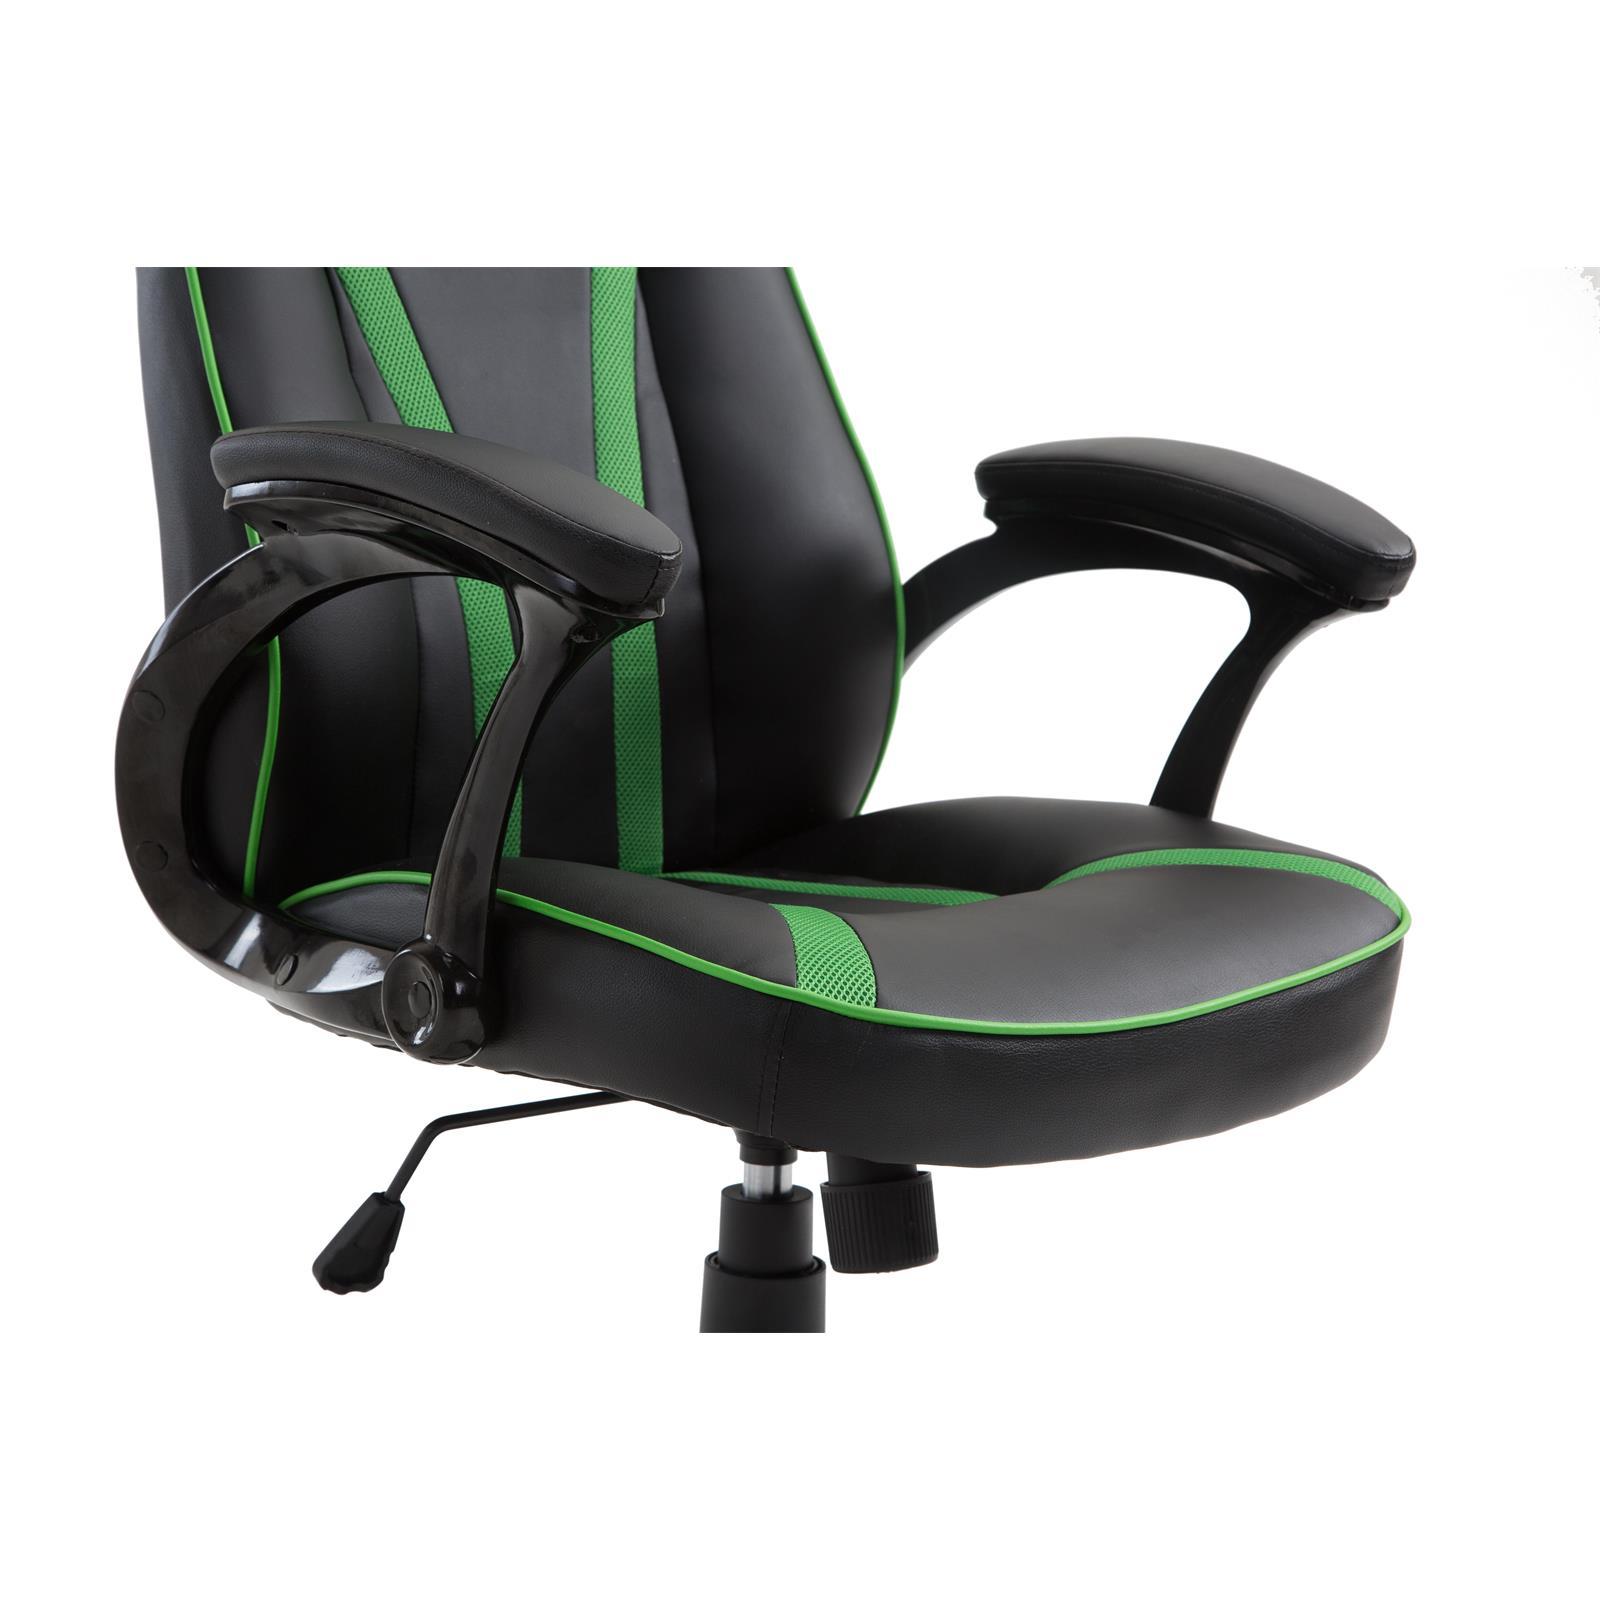 gaming drehstuhl racer racing b rostuhl schreibtischstuhl pc stuhl chefsessel ebay. Black Bedroom Furniture Sets. Home Design Ideas